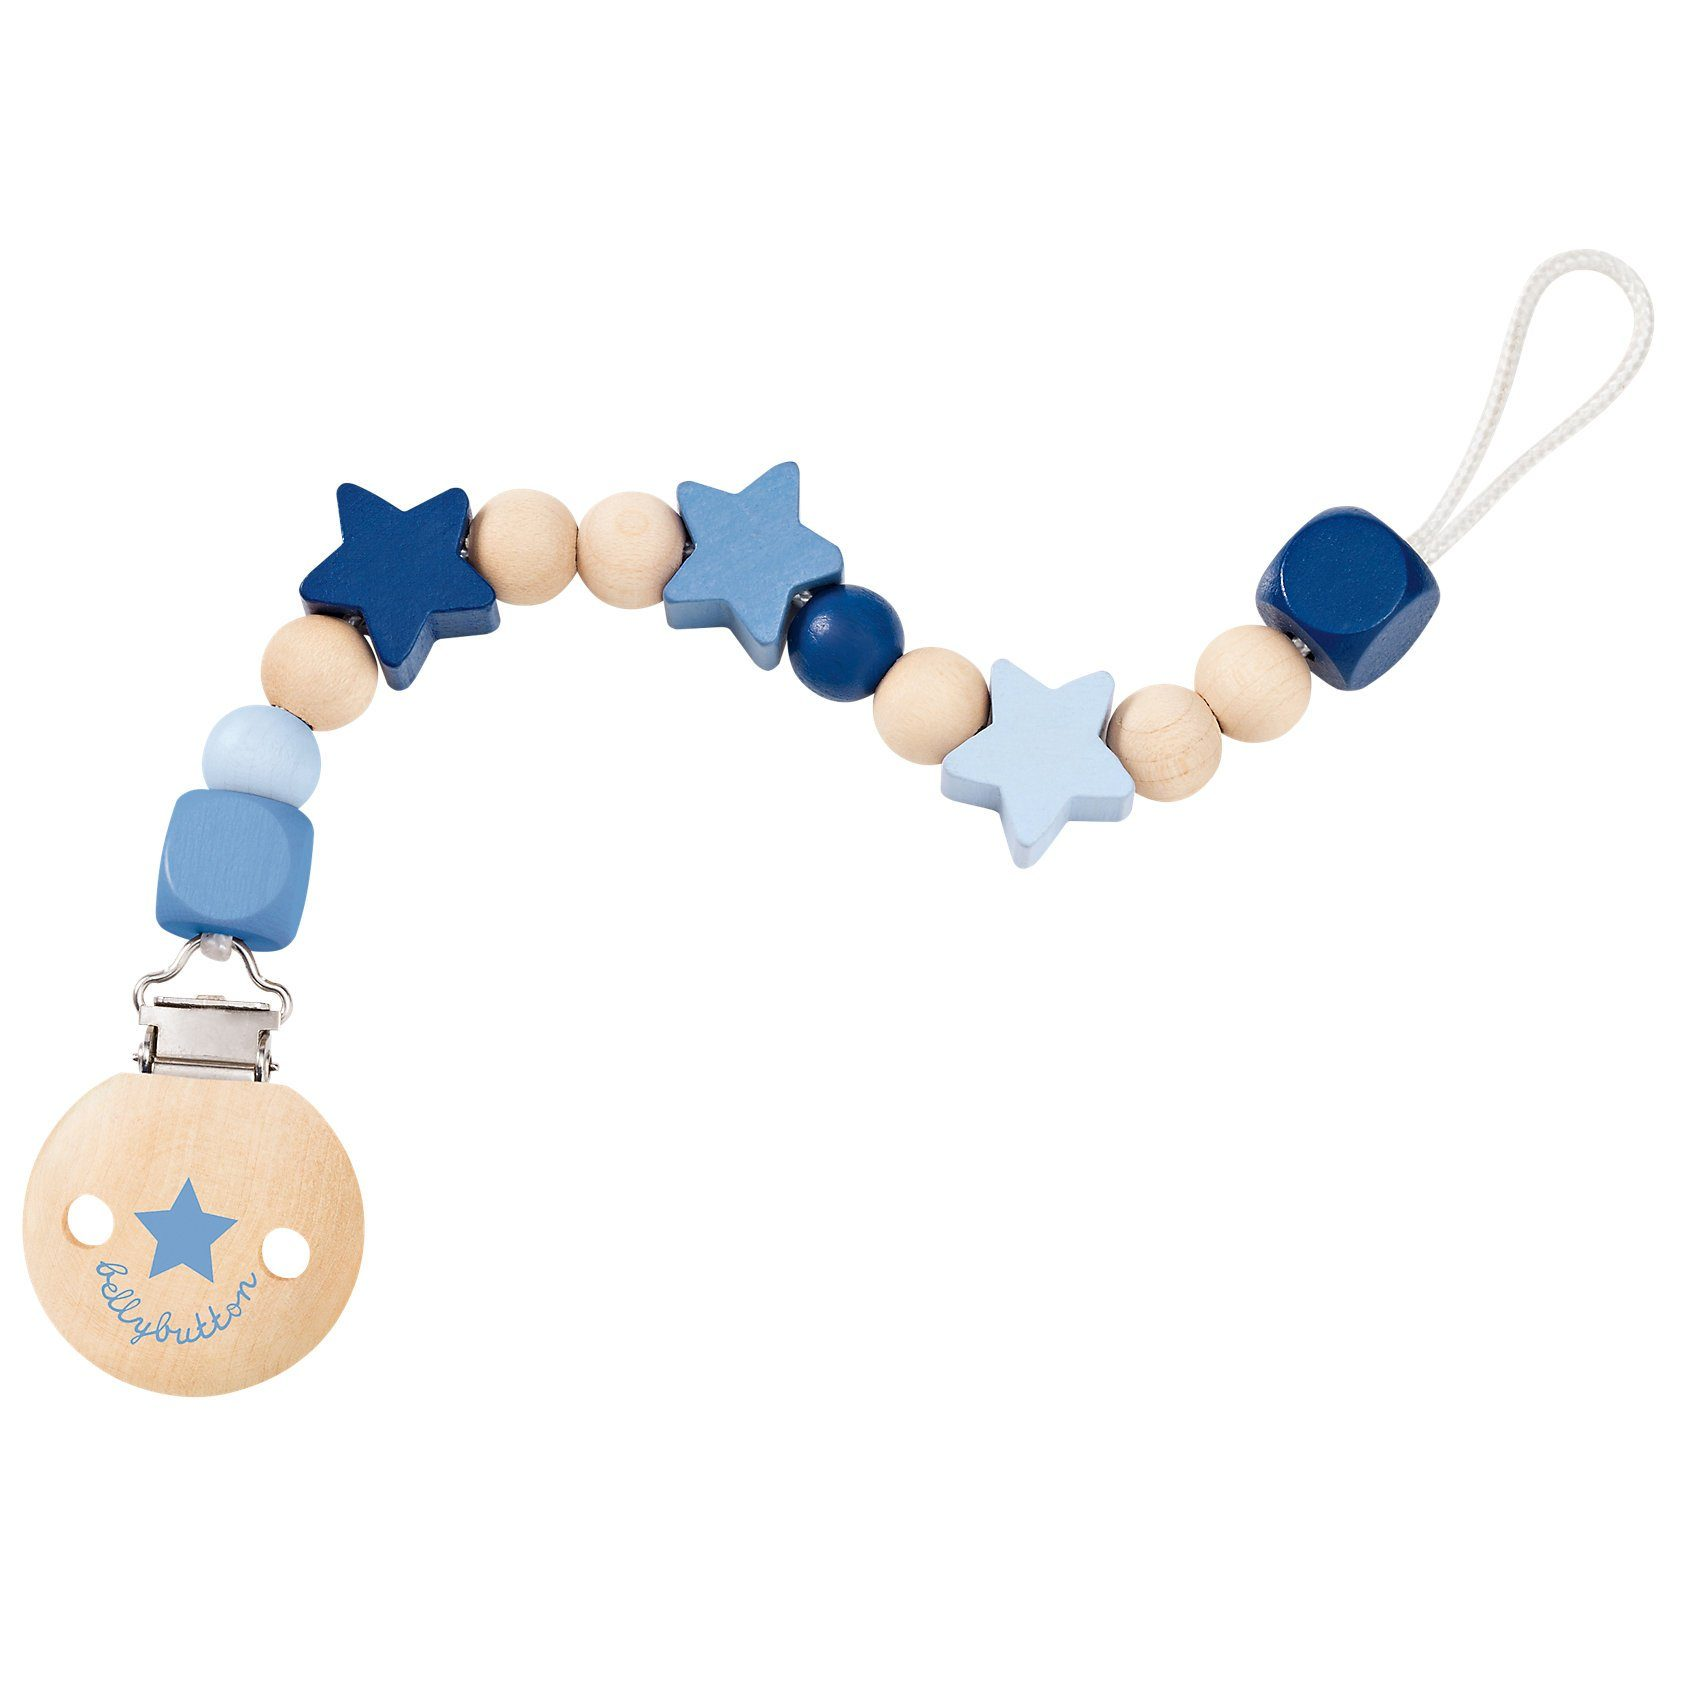 Selecta Sternchenglück Schnullerkette blau